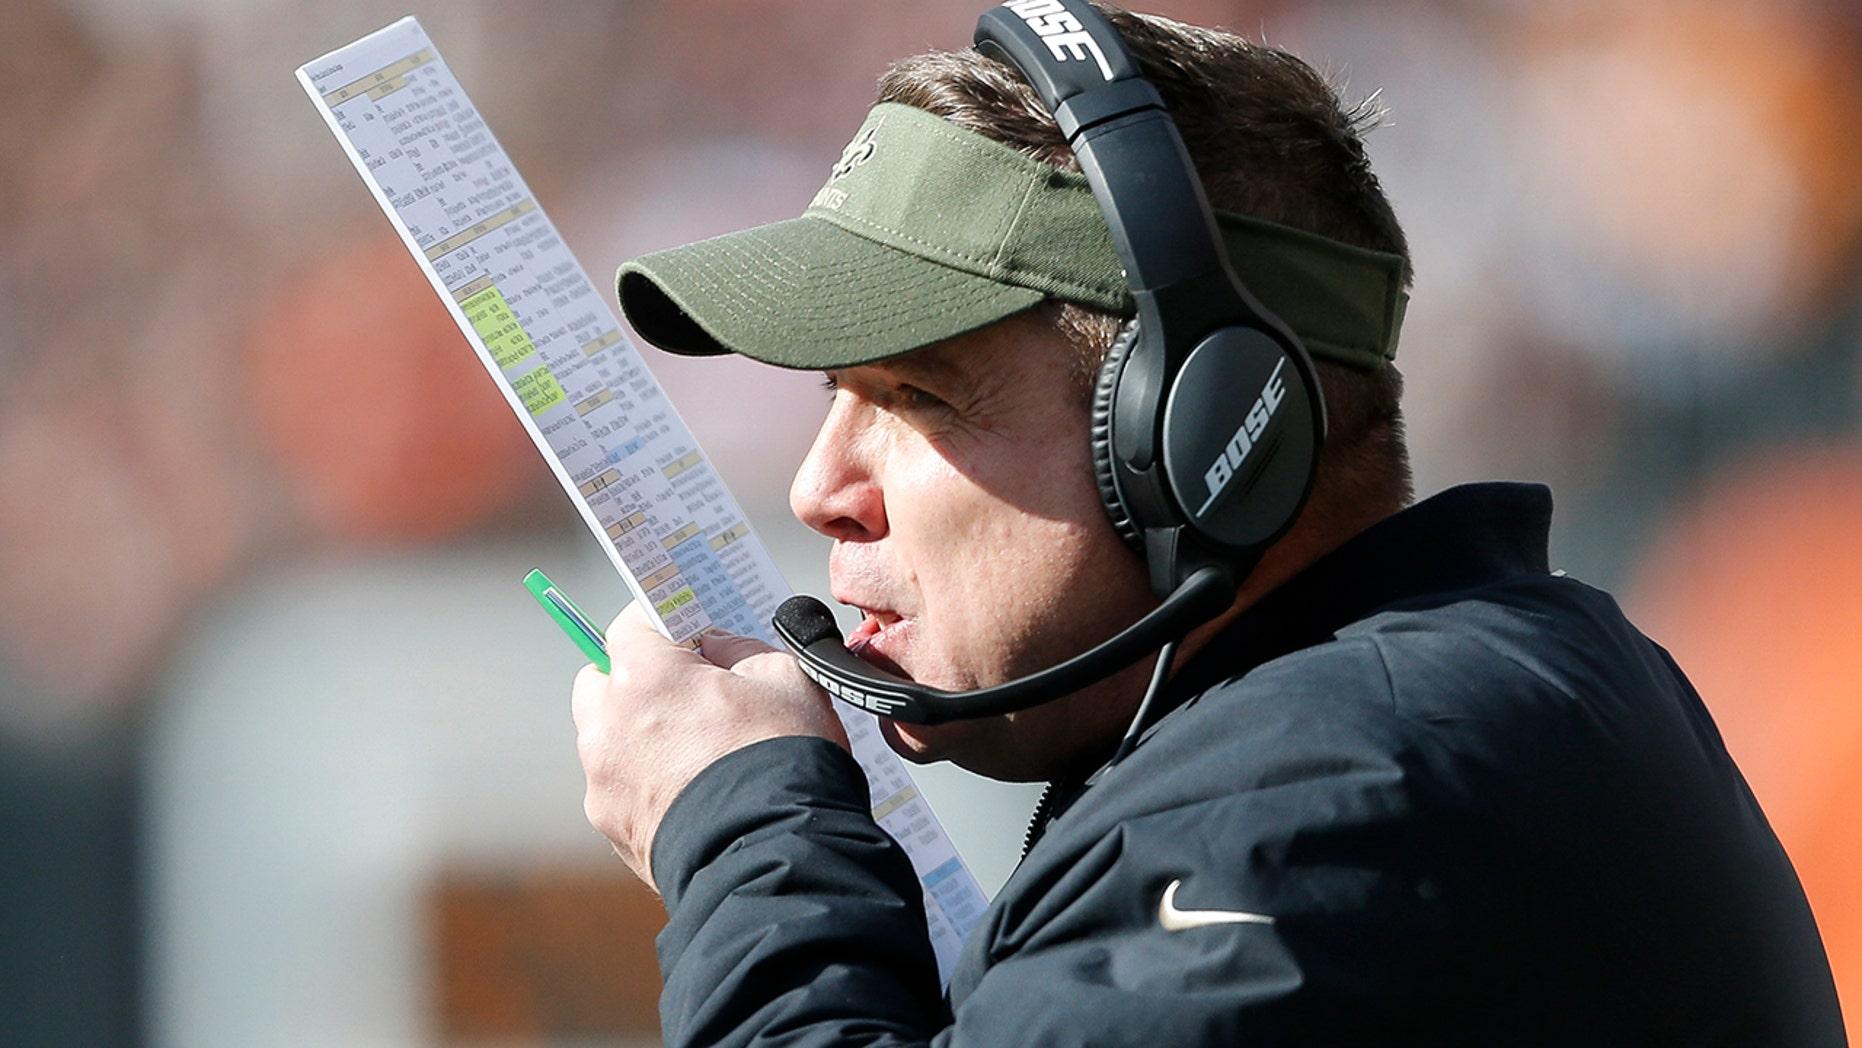 New Orleans Saints head coach Sean Payton was accused of smashing a fire alarm at Paul Brown Stadium in Cincinnati.